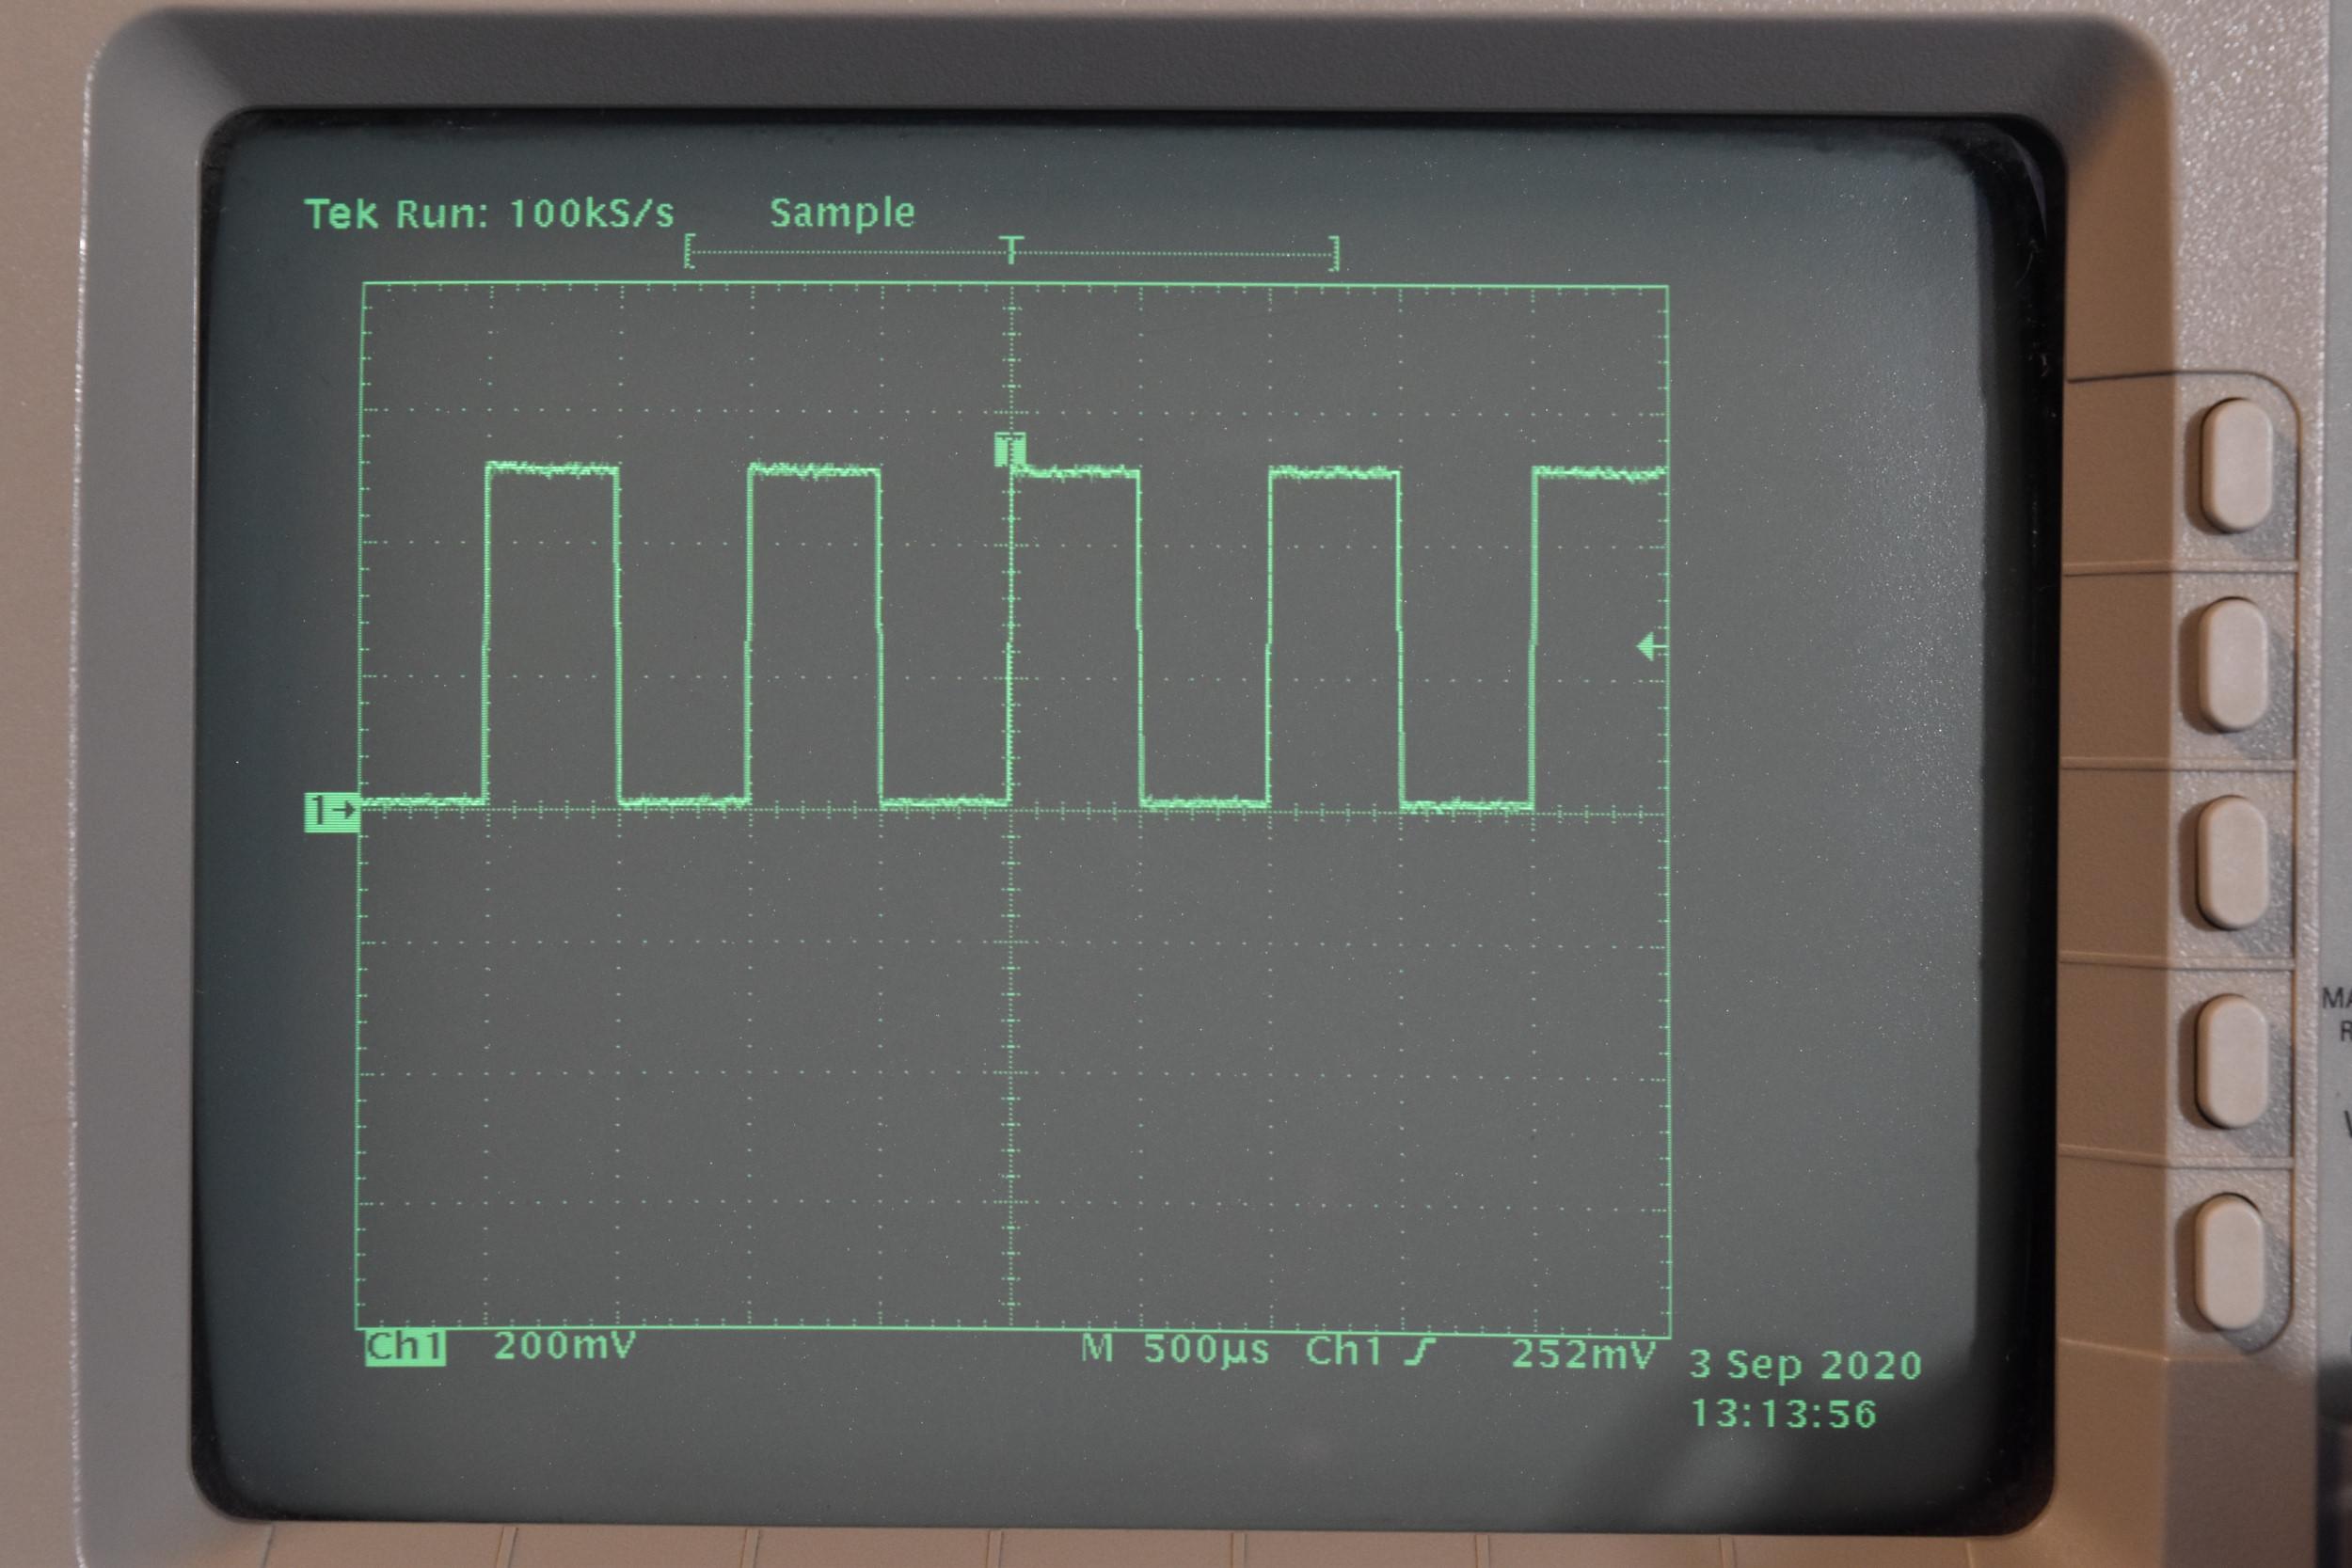 SN 960_002